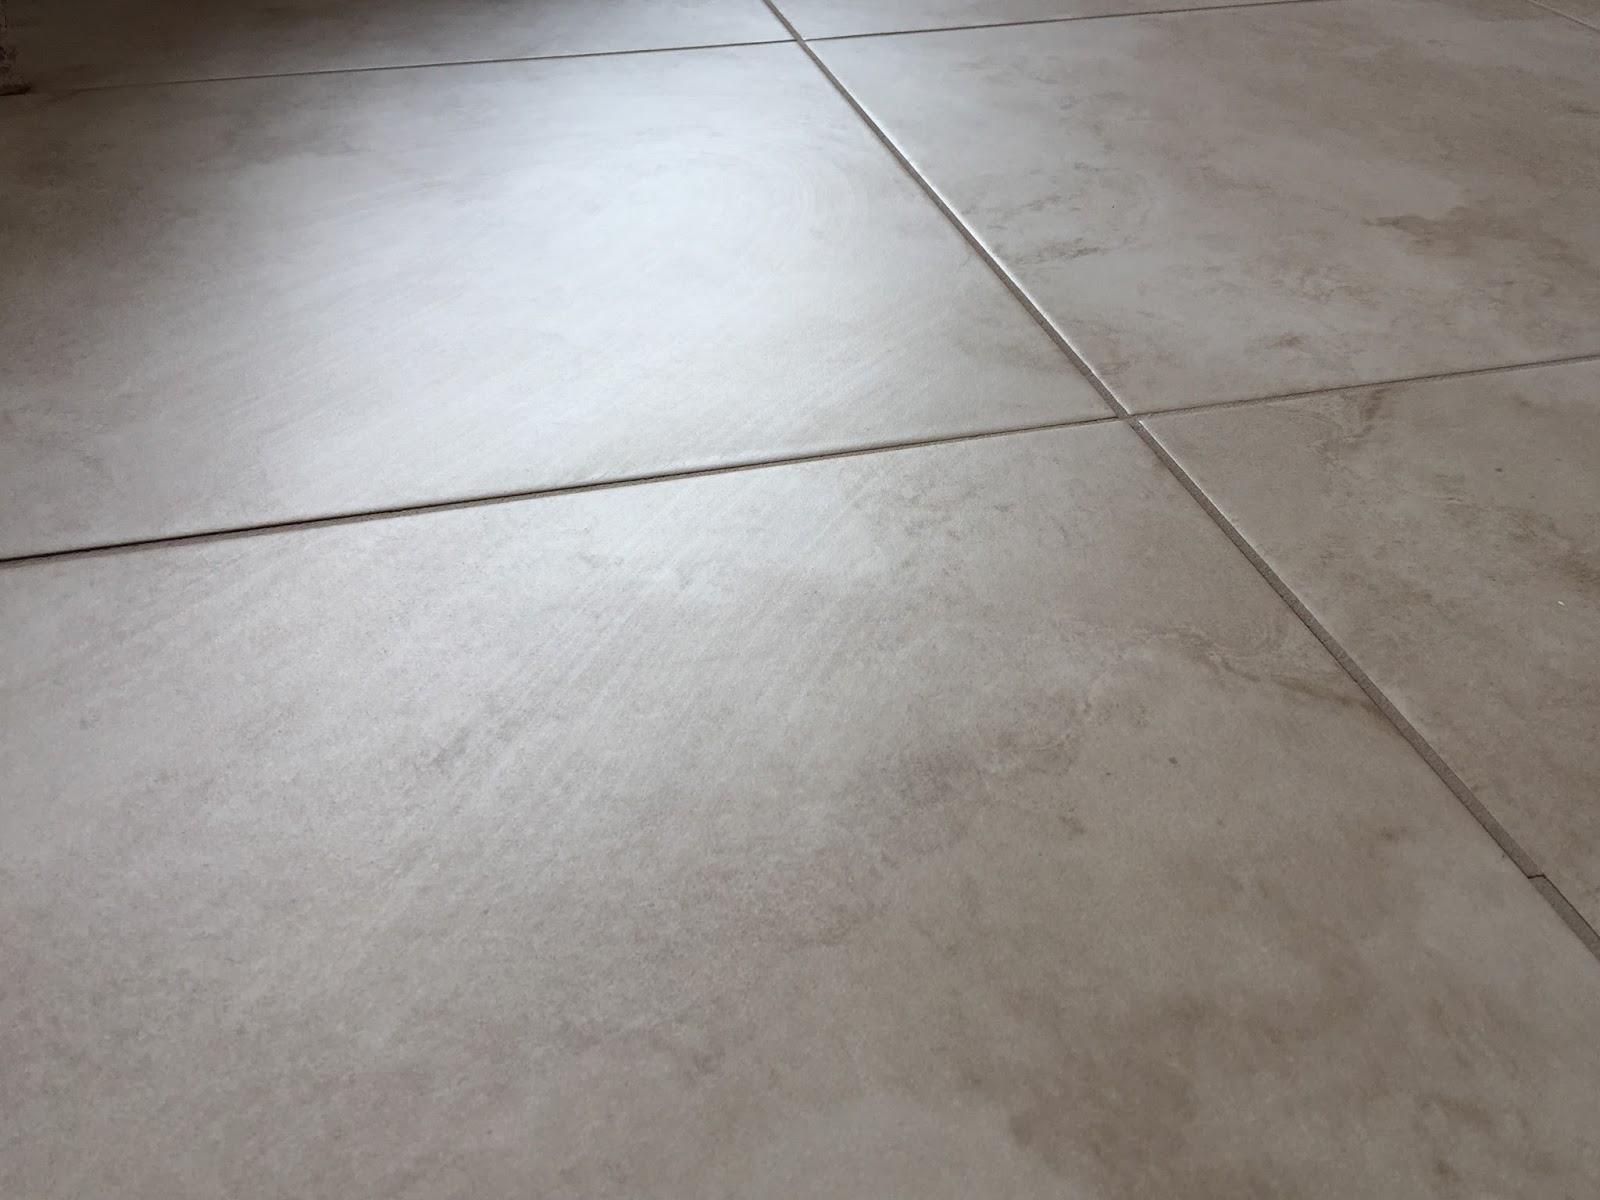 Funky Best Way To Clean High Gloss Floor Tiles Pictures - Home Floor ...